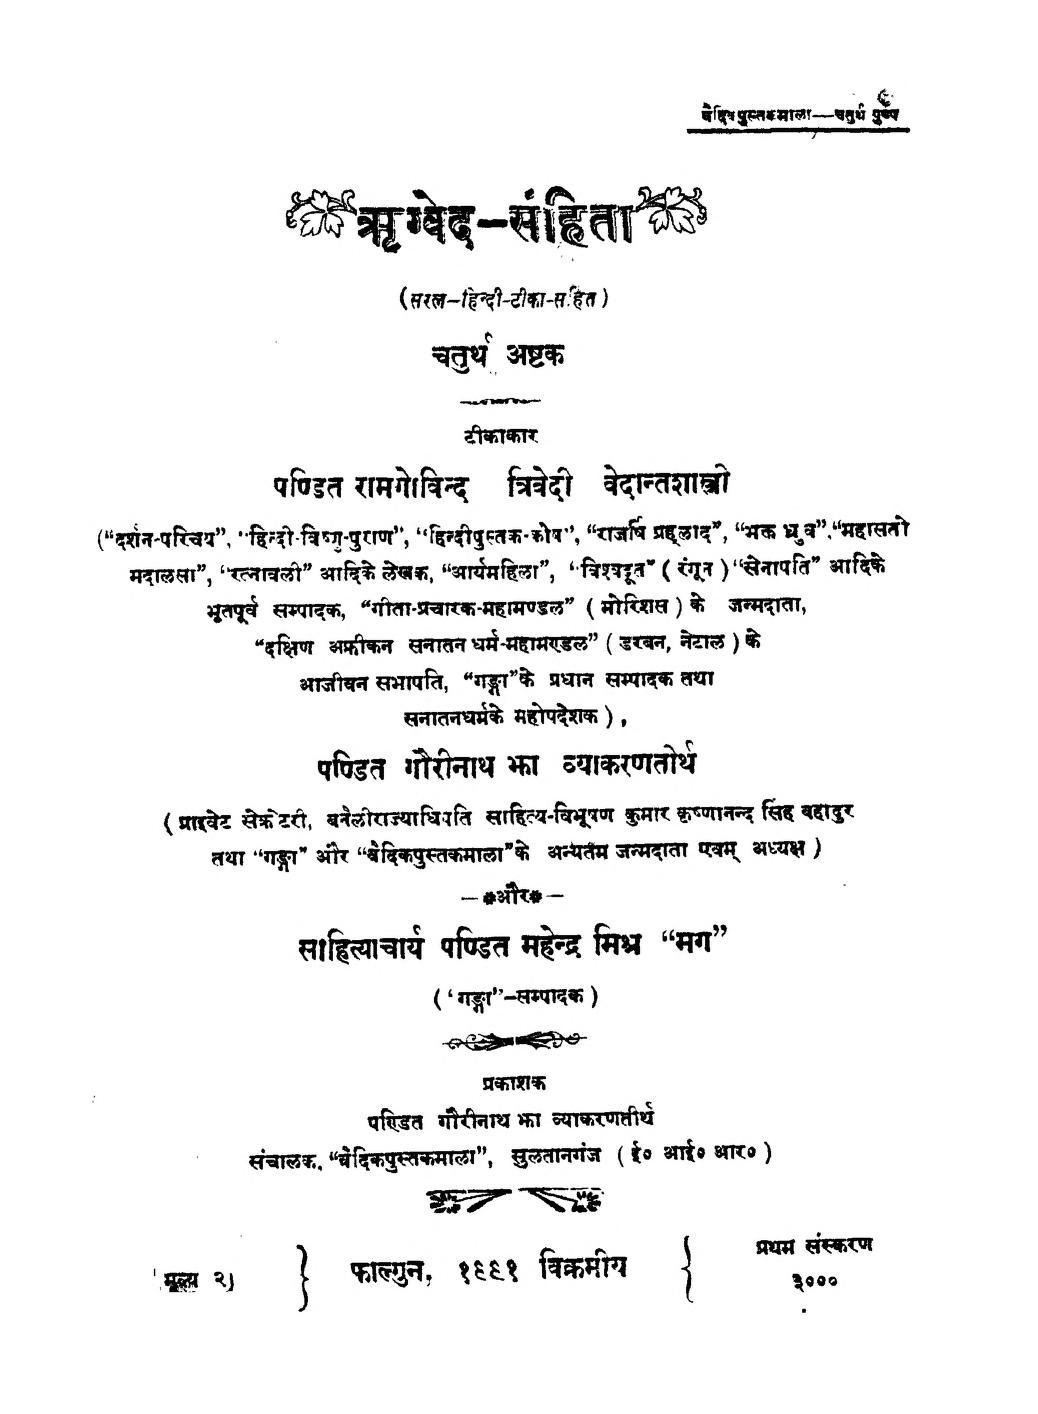 Book Image : ऋग्वेद - संहिता - Rigwed Sanhita